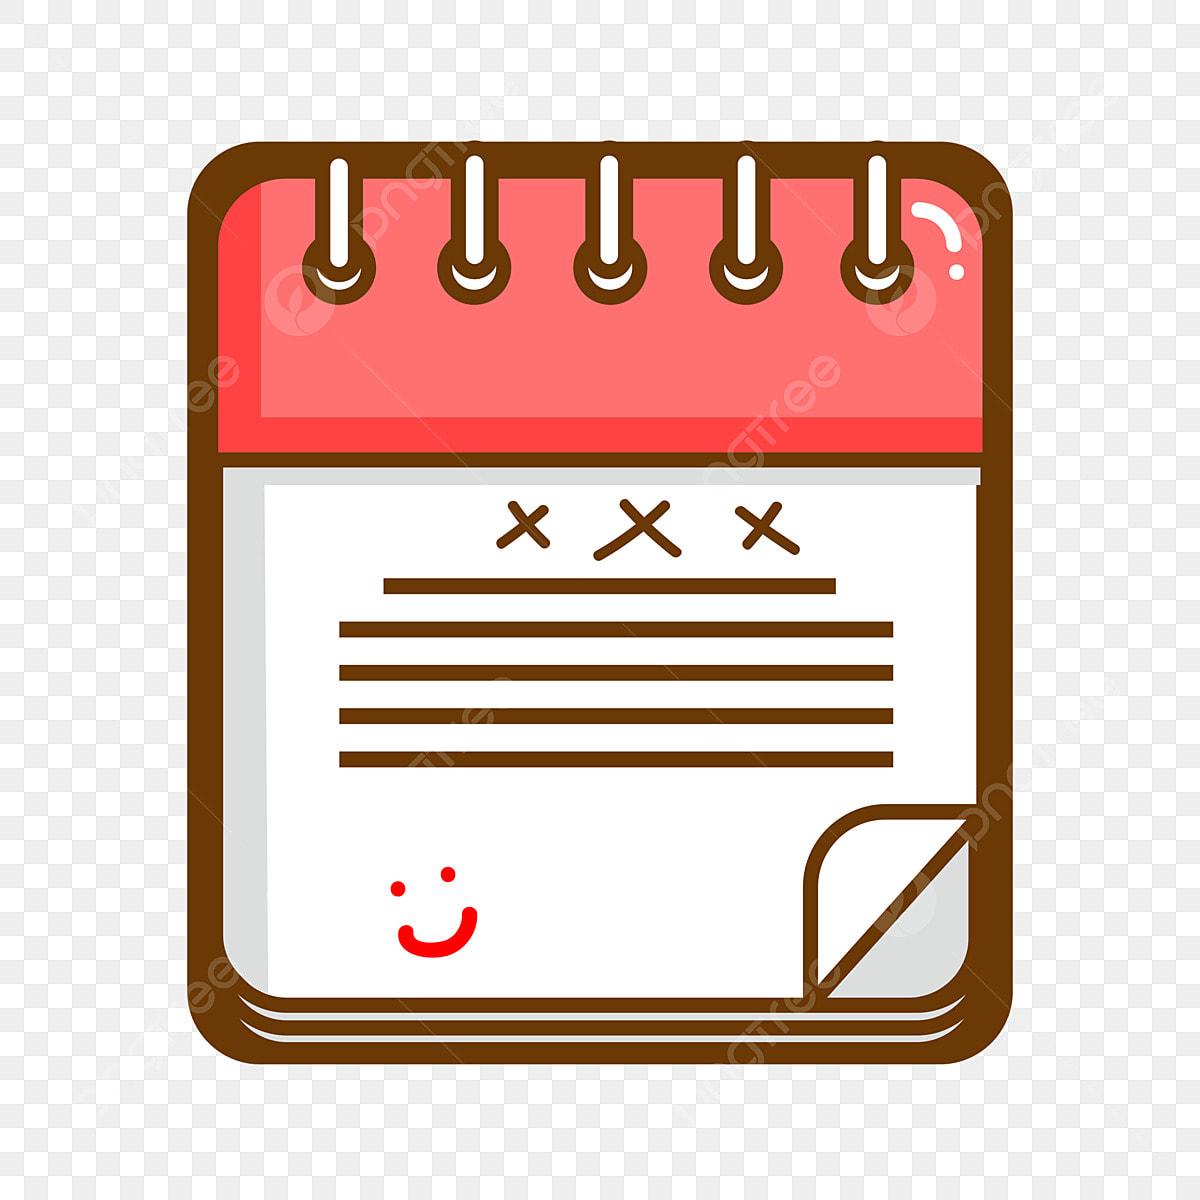 Calendario Dibujo Png.Material De Cuaderno Calendario Dibujos Animados Dibujos